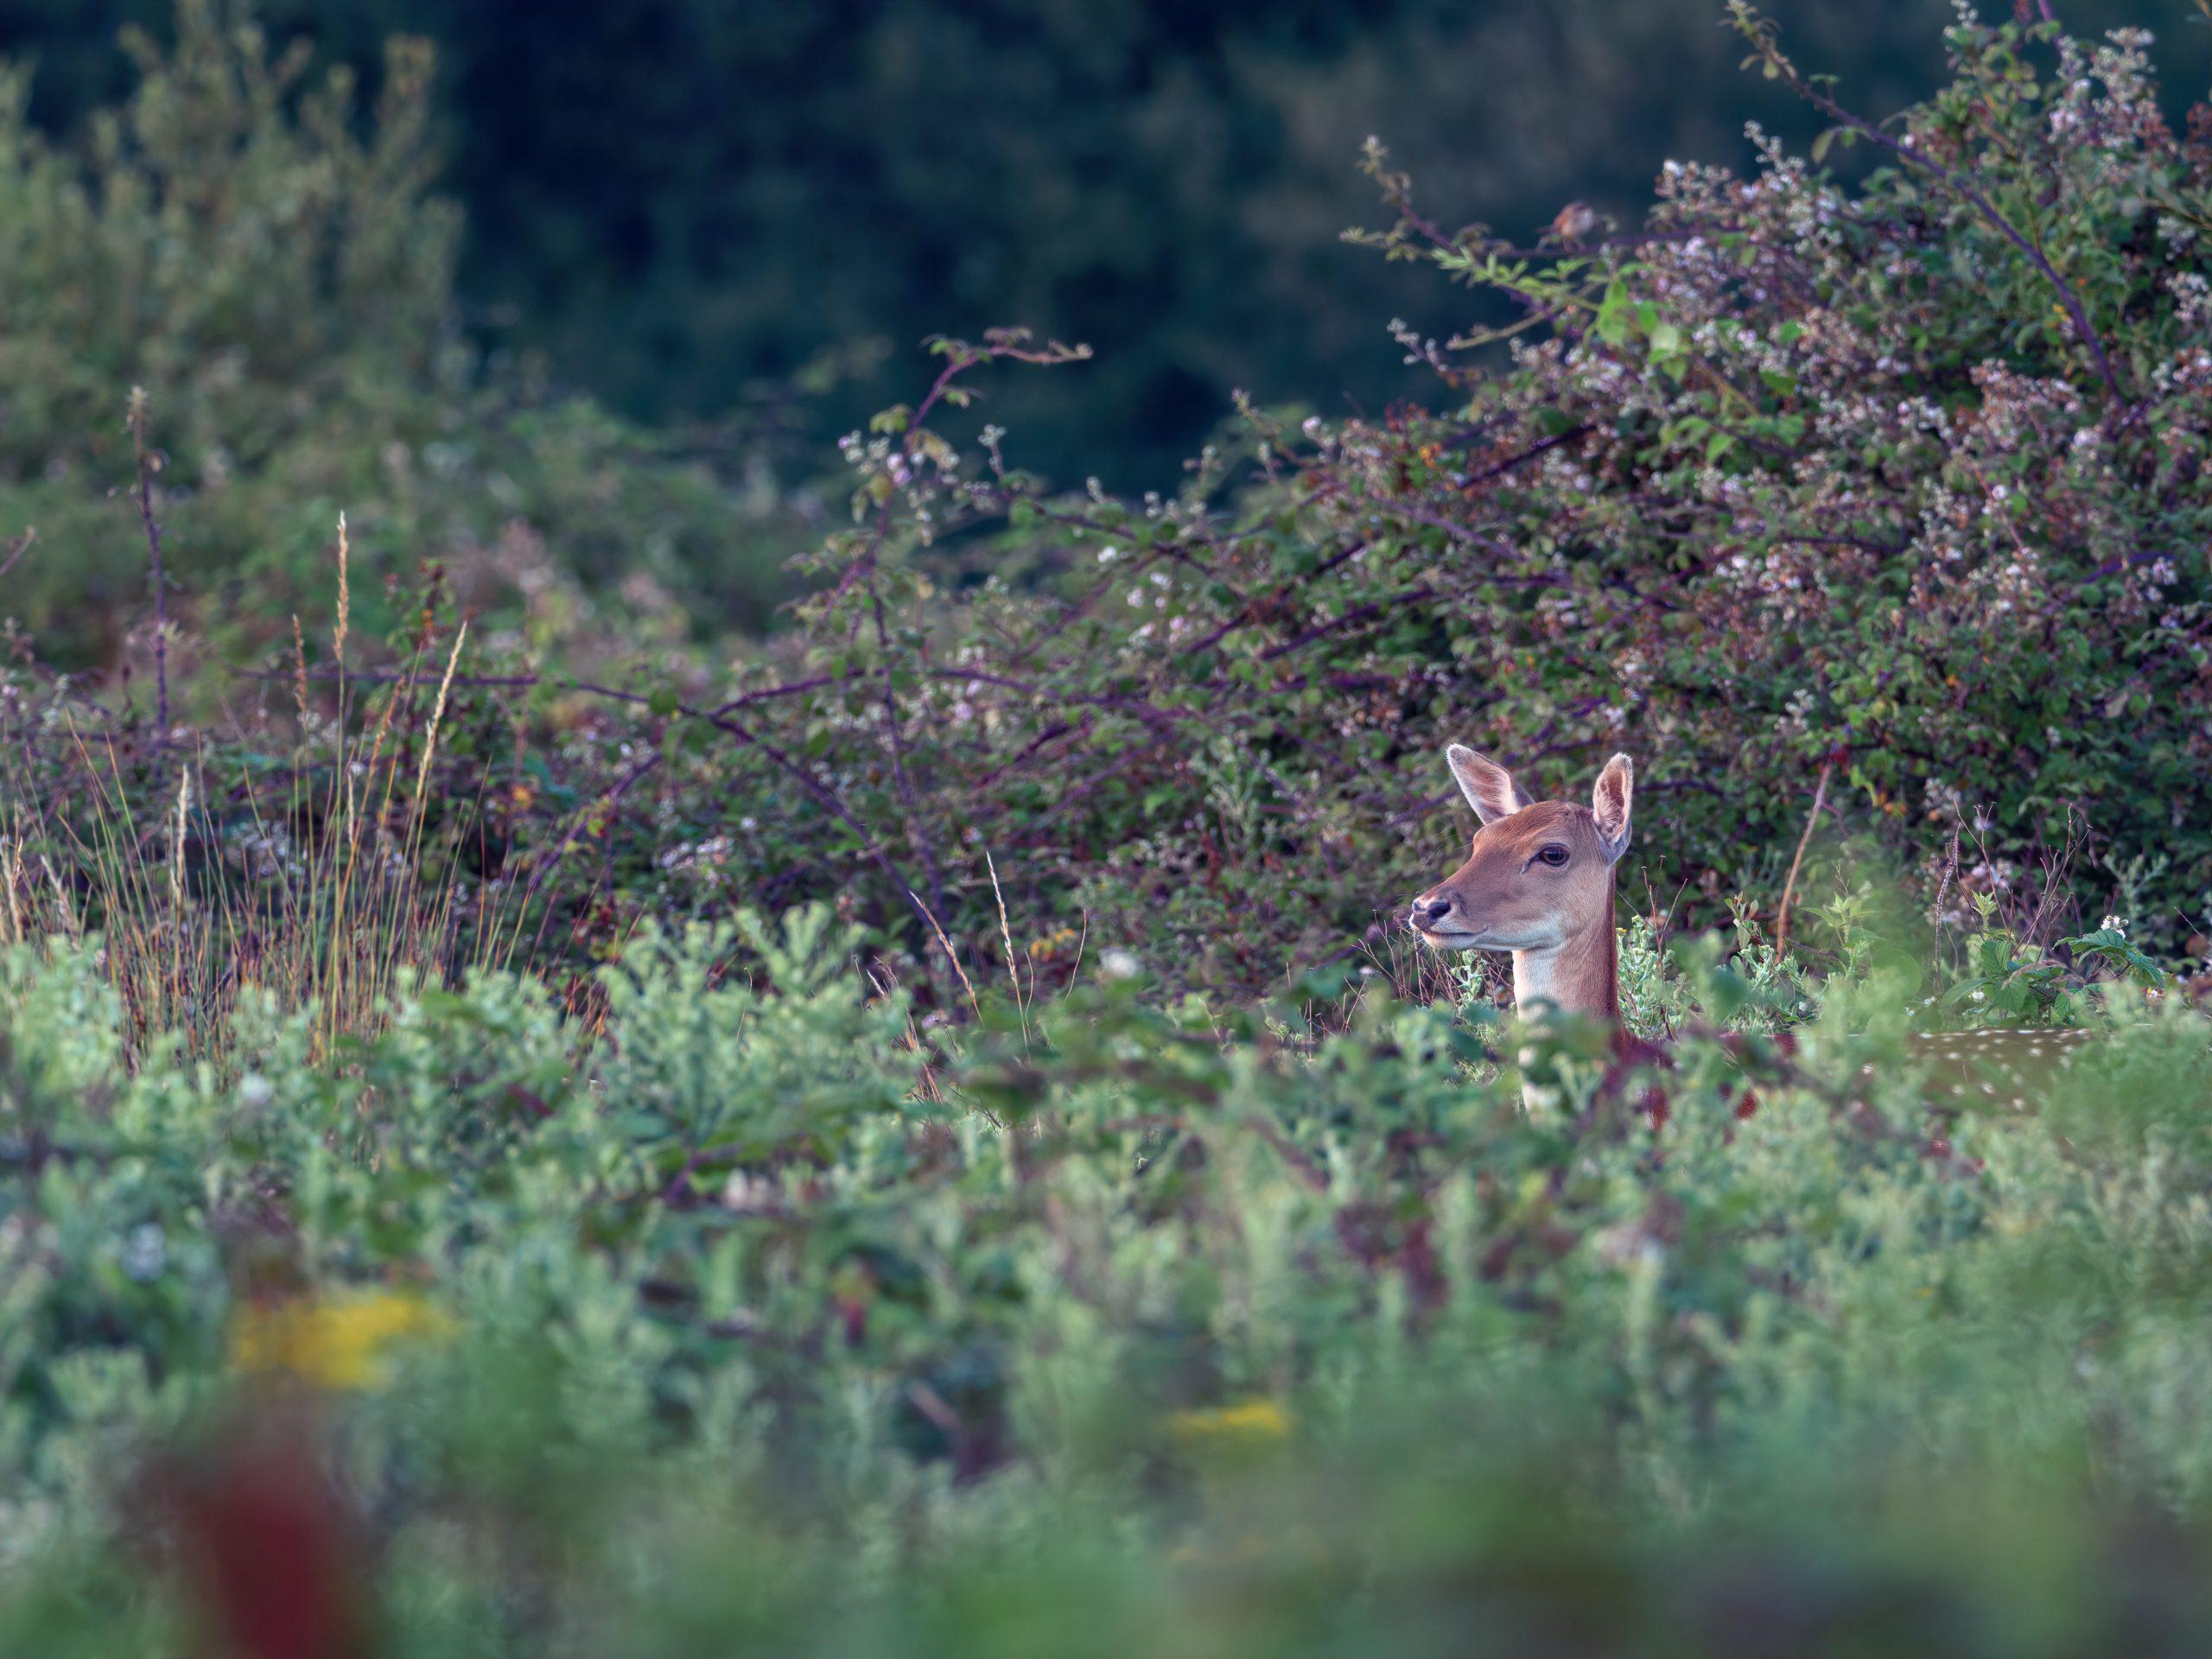 red deer peeking through undergrowth